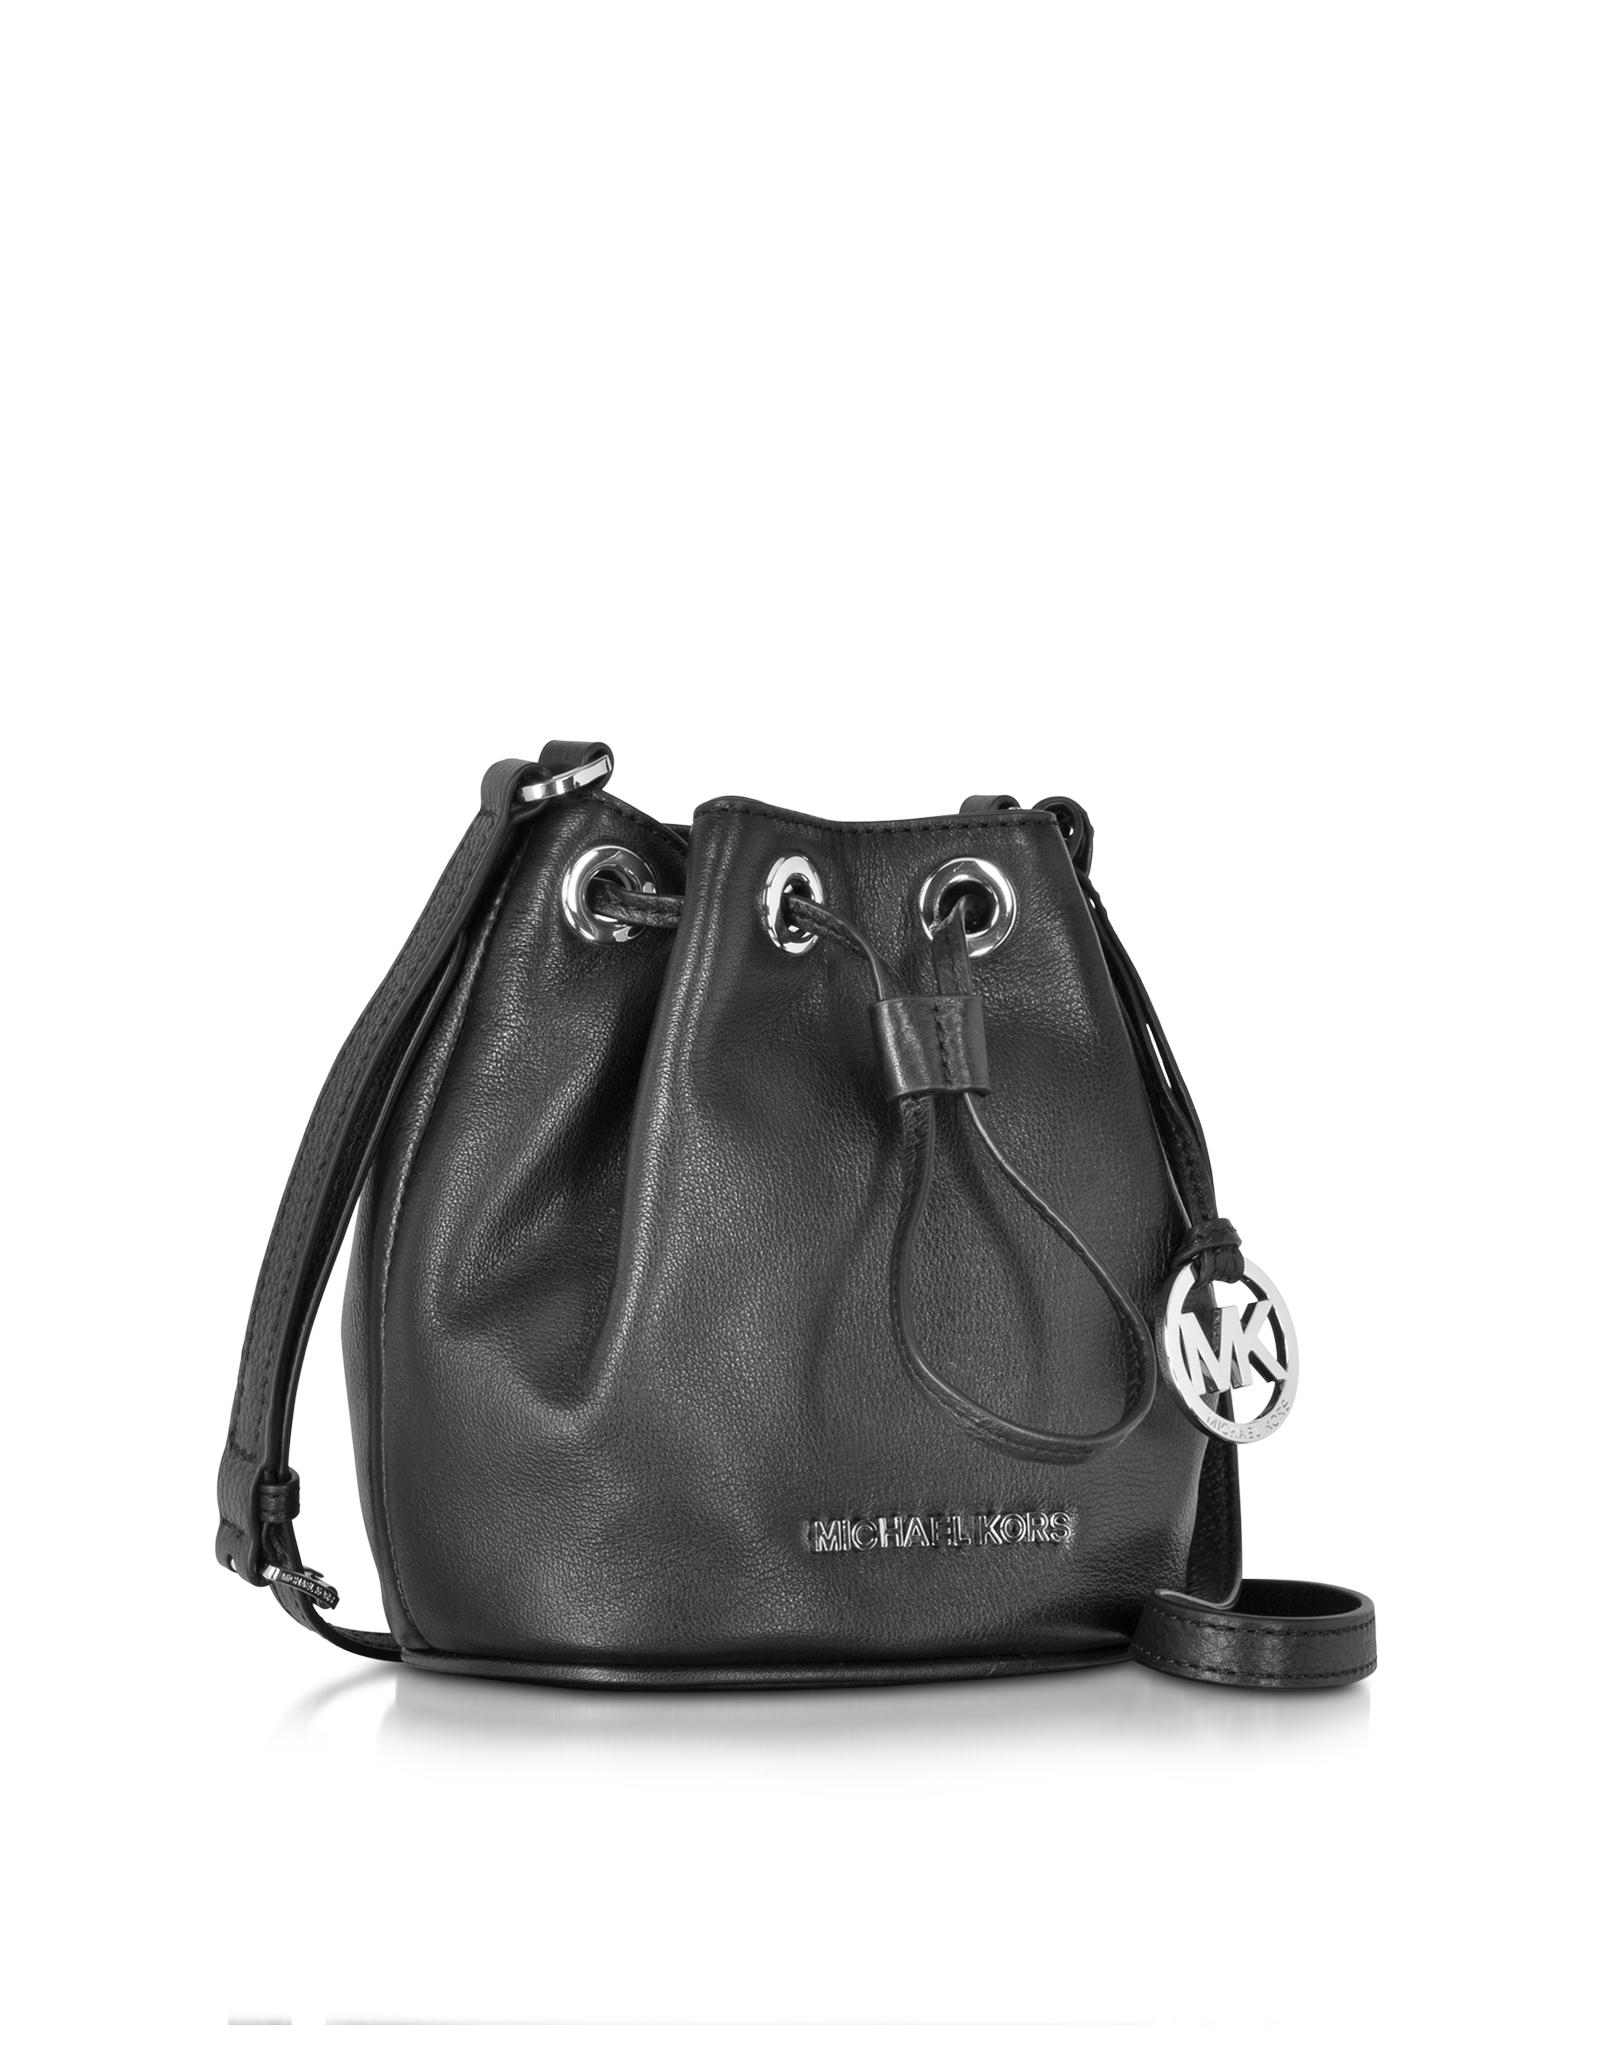 e7057df62ad9 Michael Kors Jules Black Soft Leather Drawstring Crossbody Bag in ...